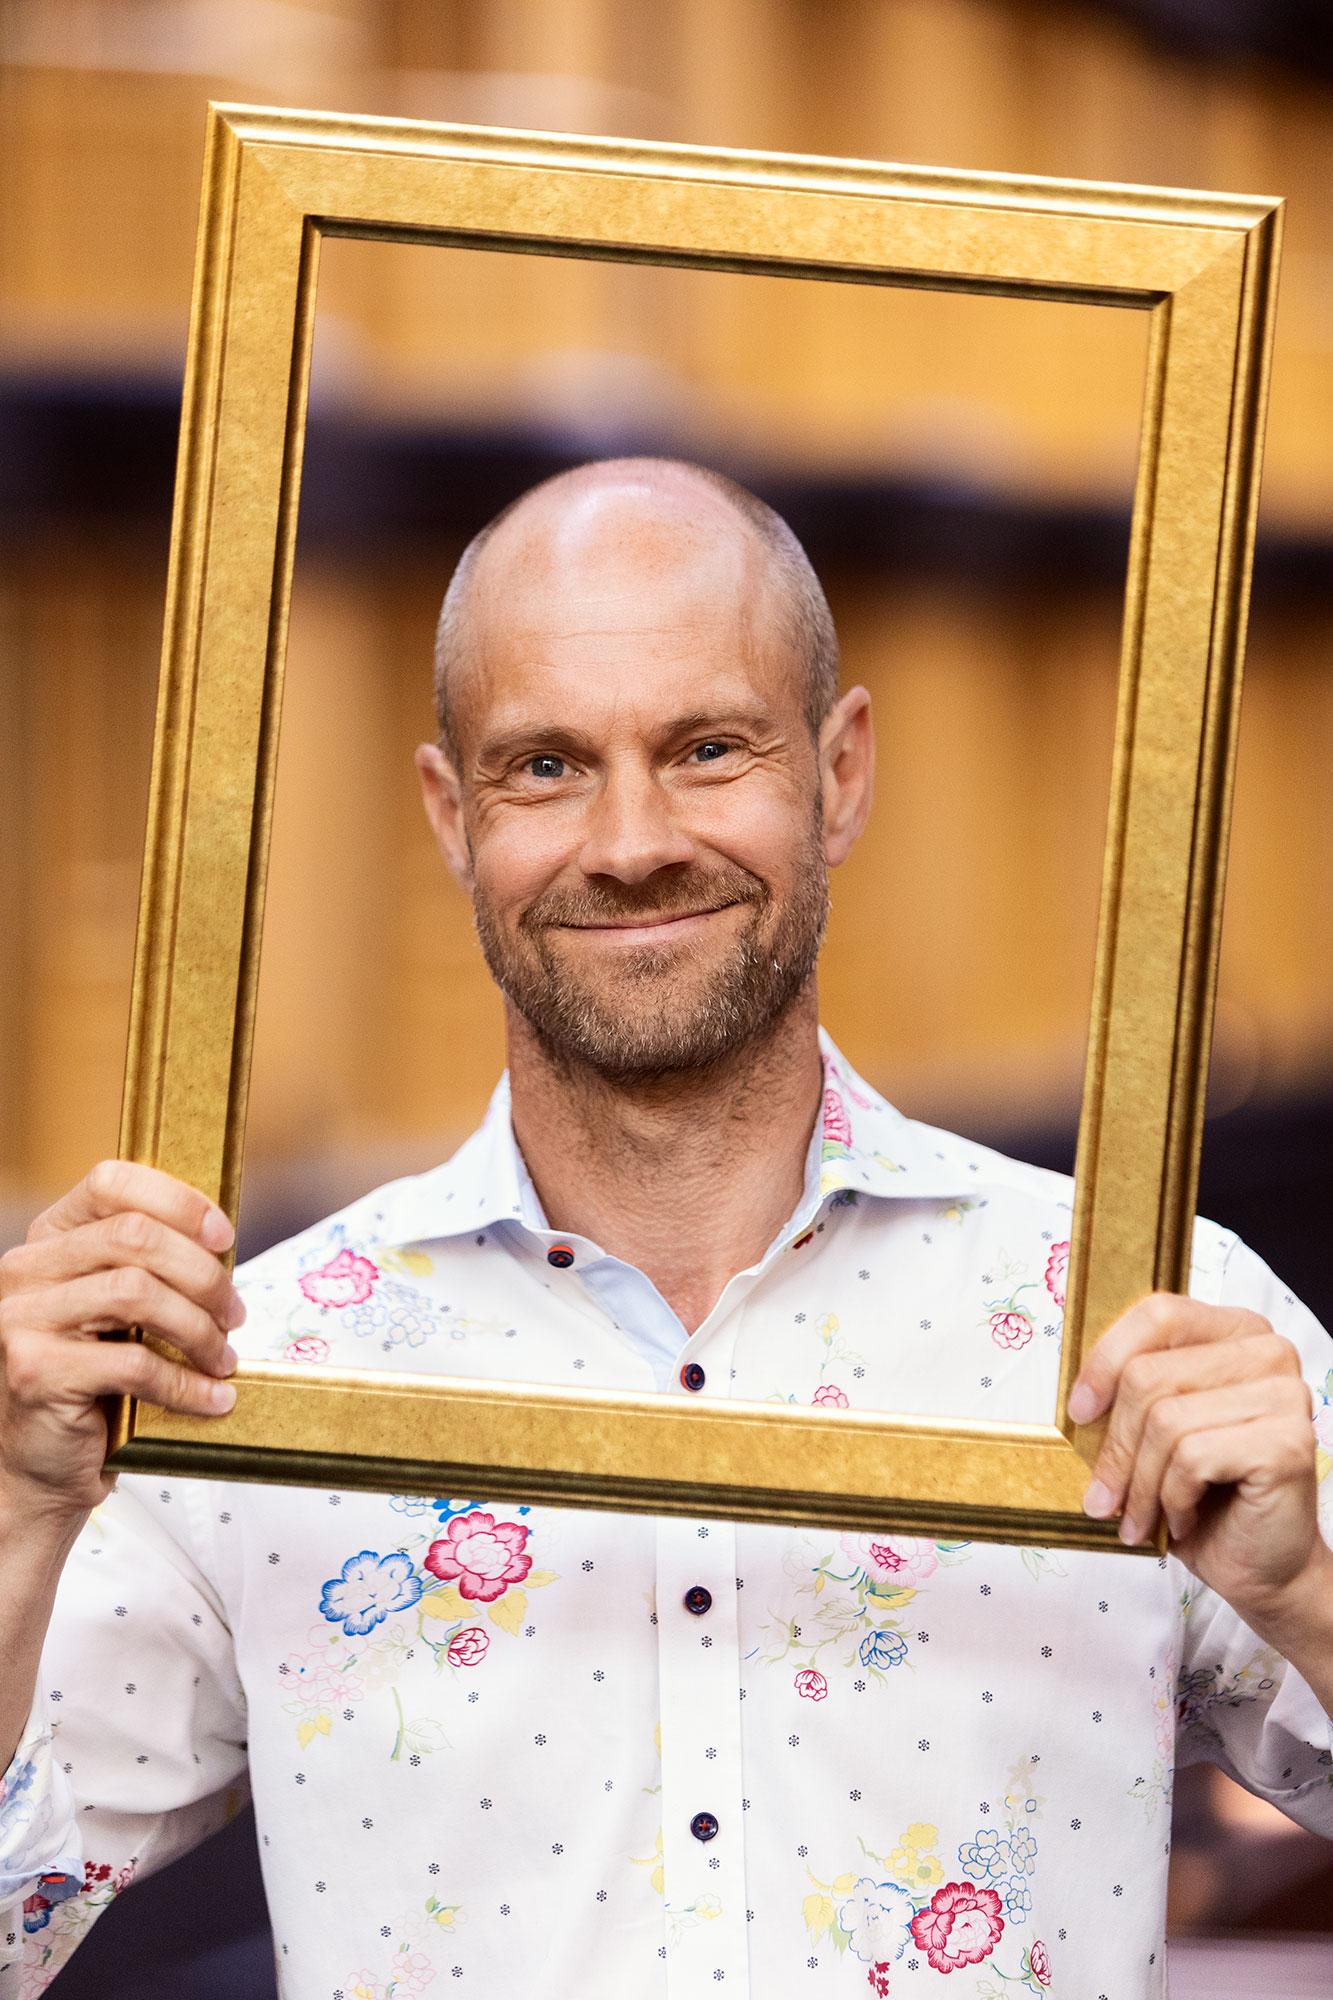 Kenth Svensson